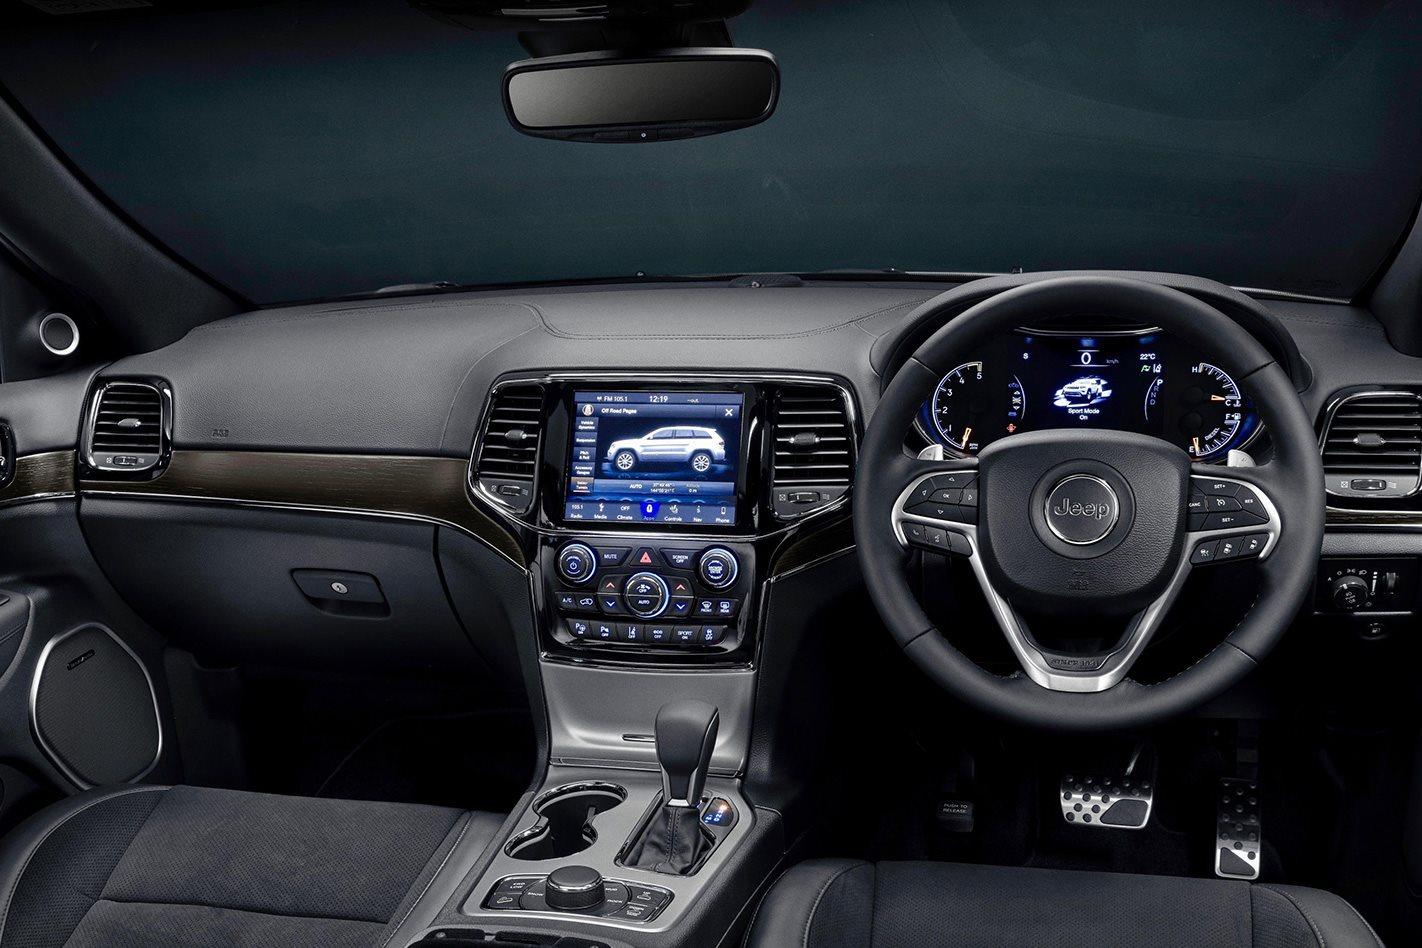 new v8 jeep grand cherokee breaks cover